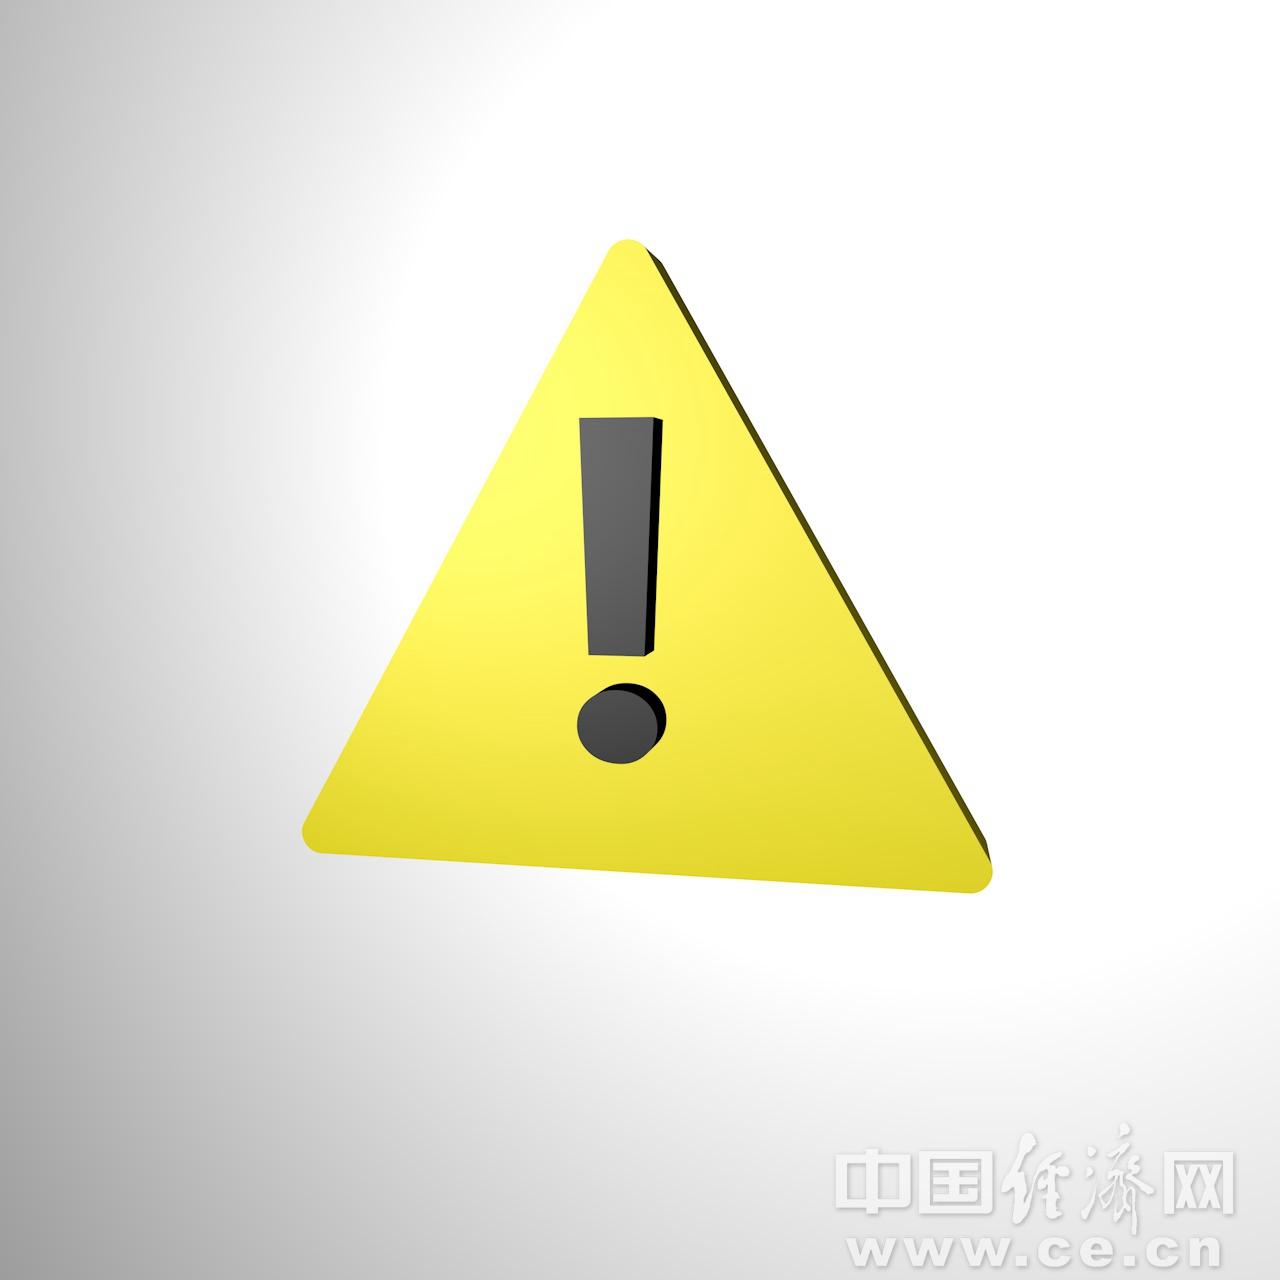 YD2011155感叹号警示周媛媛其他.jpg